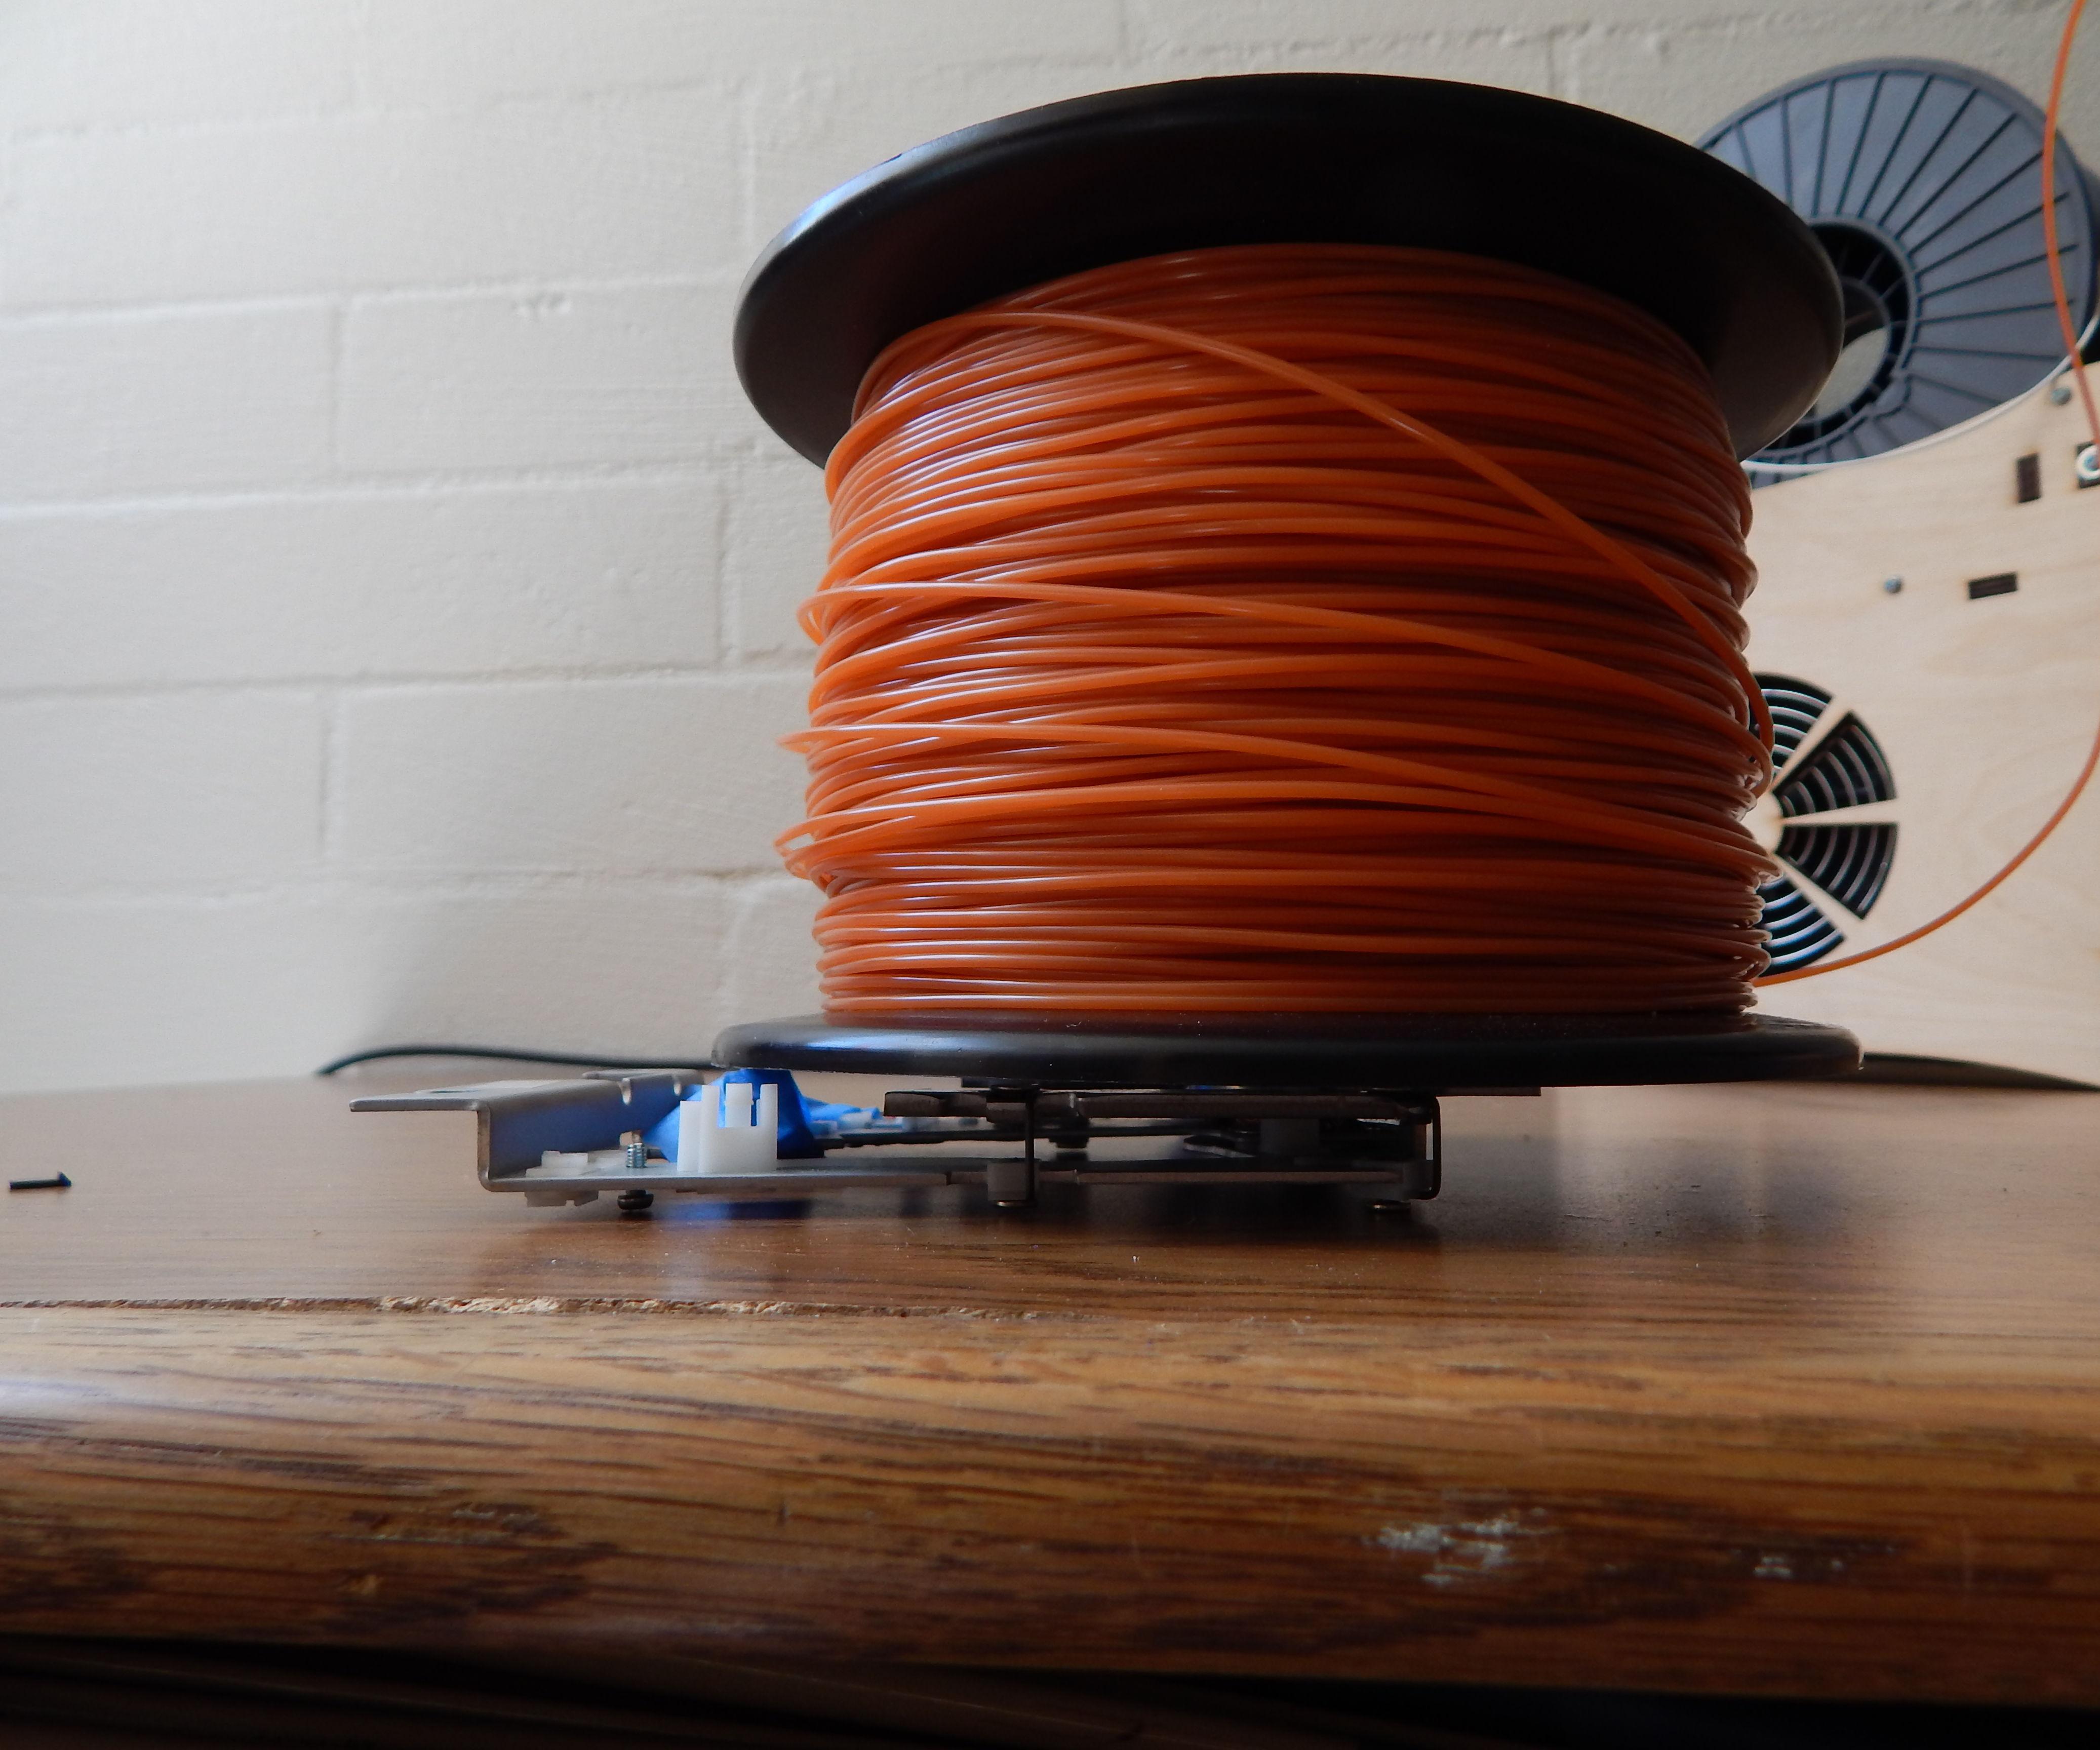 Cheap, Easy, Universal Filament holder